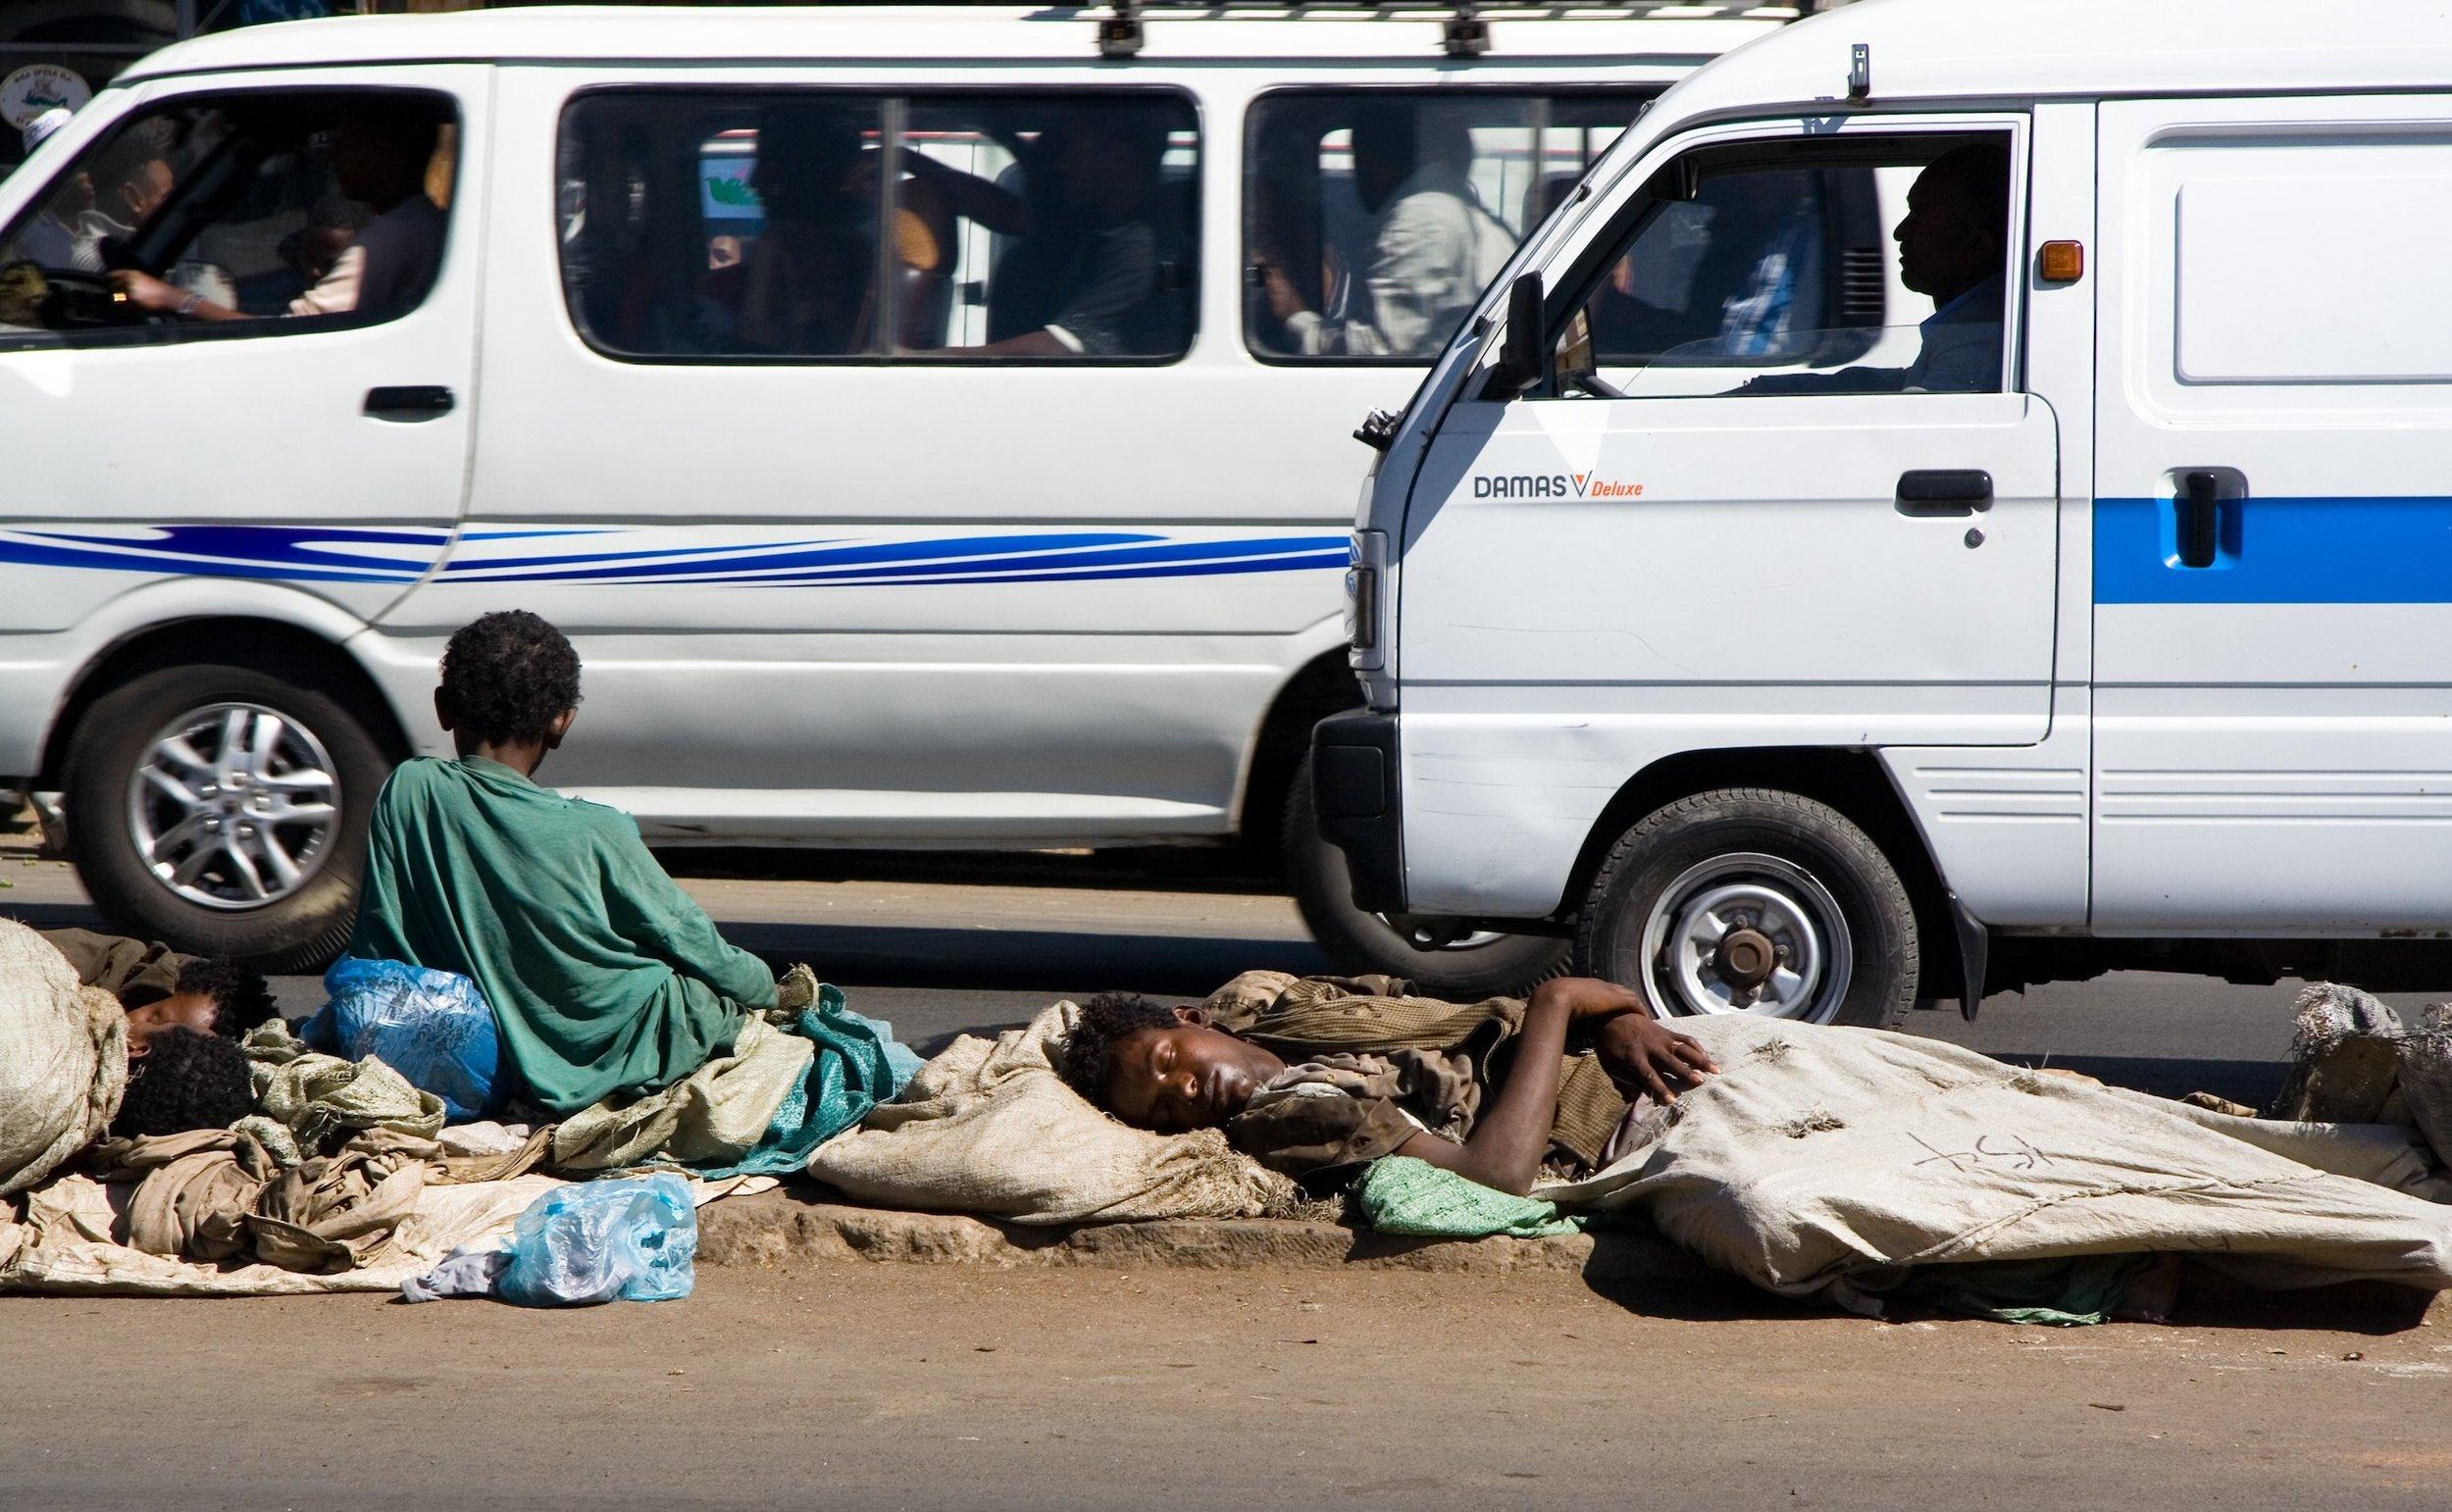 Sleeping-on-medion-in-Addis-blog1.jpg